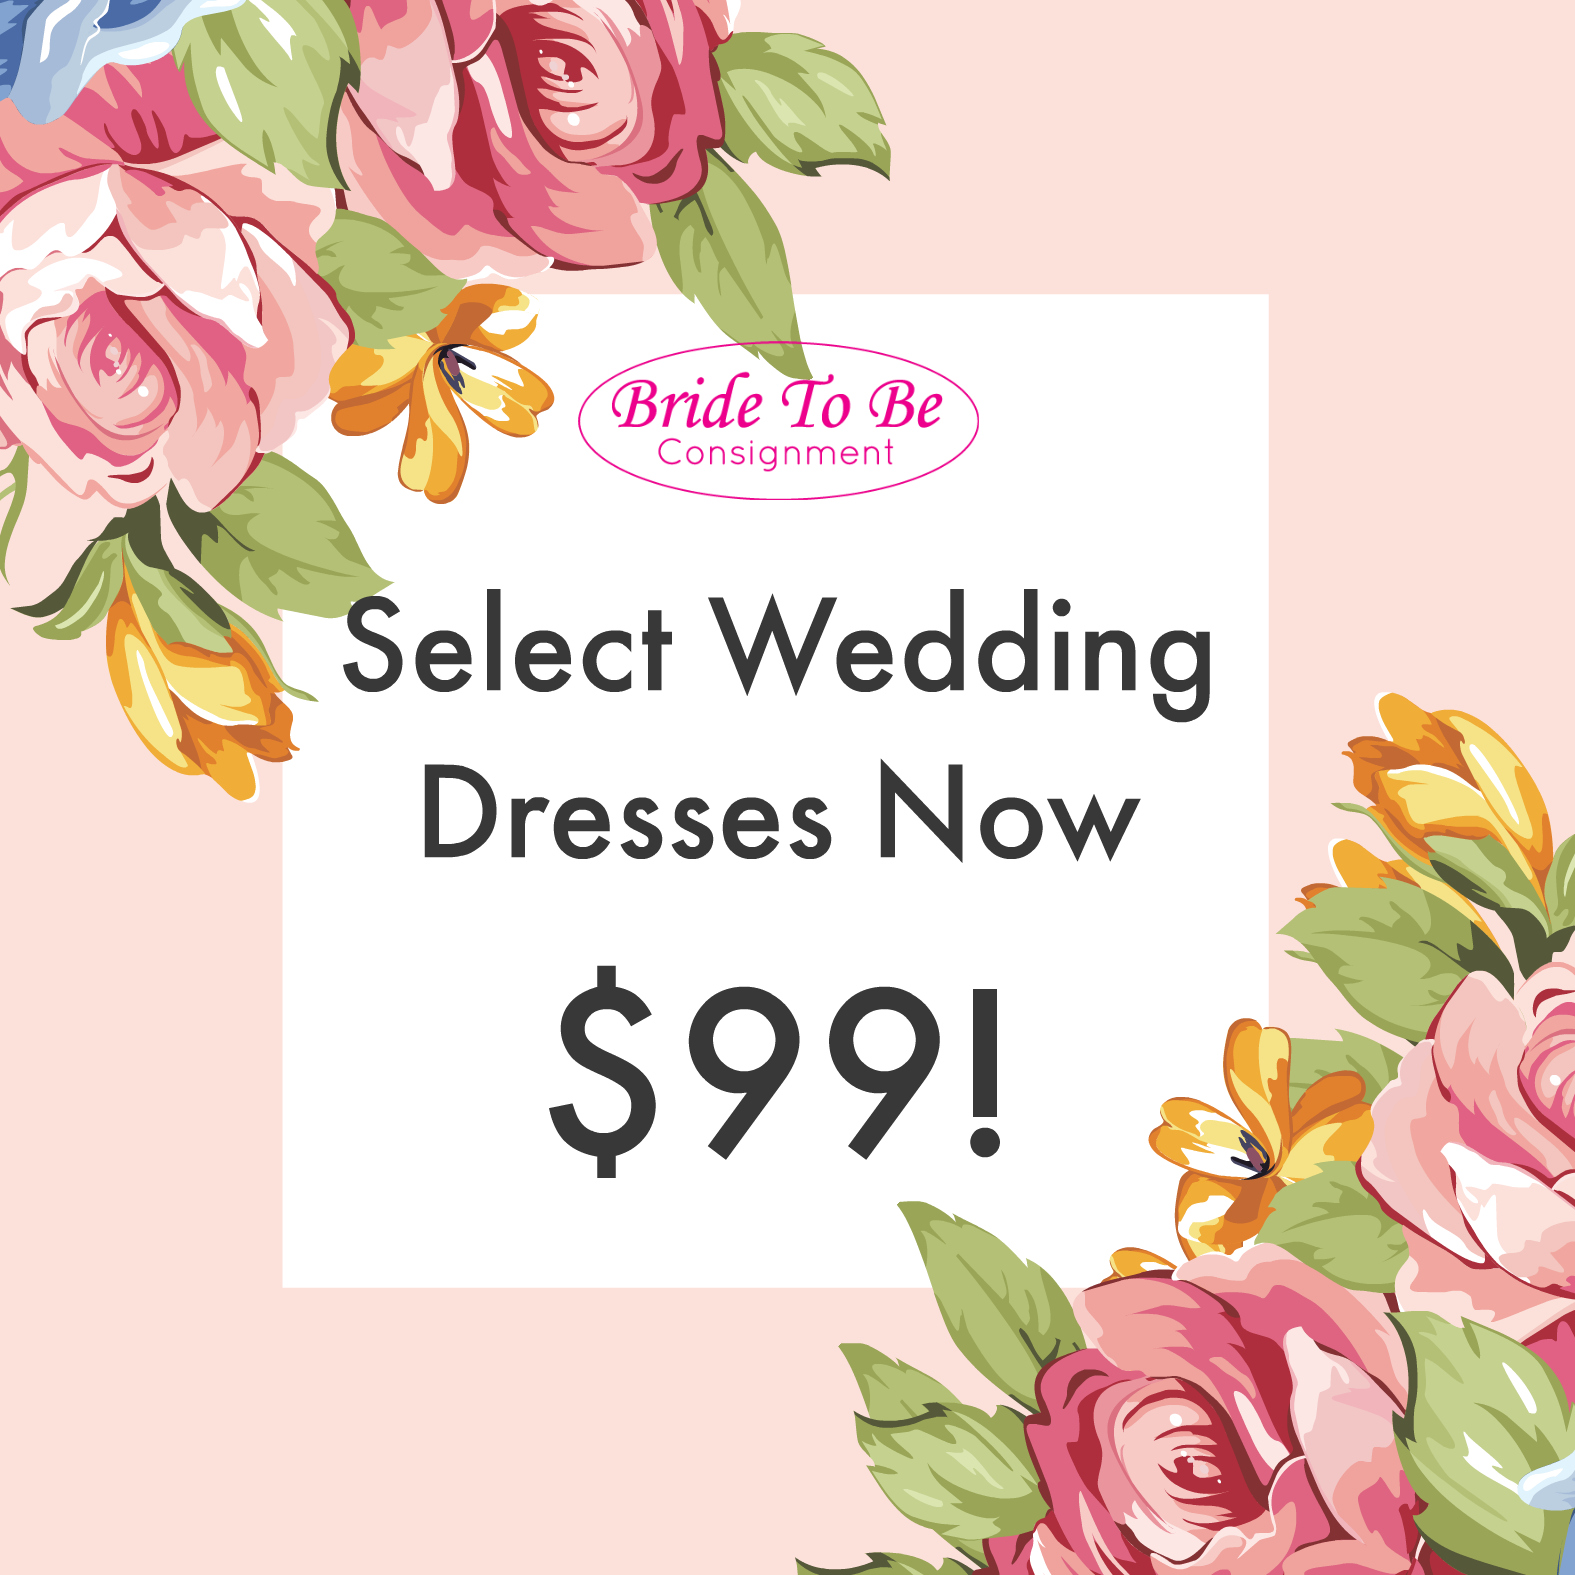 Black Tag Dress Sale - Black Tag Wedding Dresses as low as $99.Black Tag Formal Dresses as low as $10.